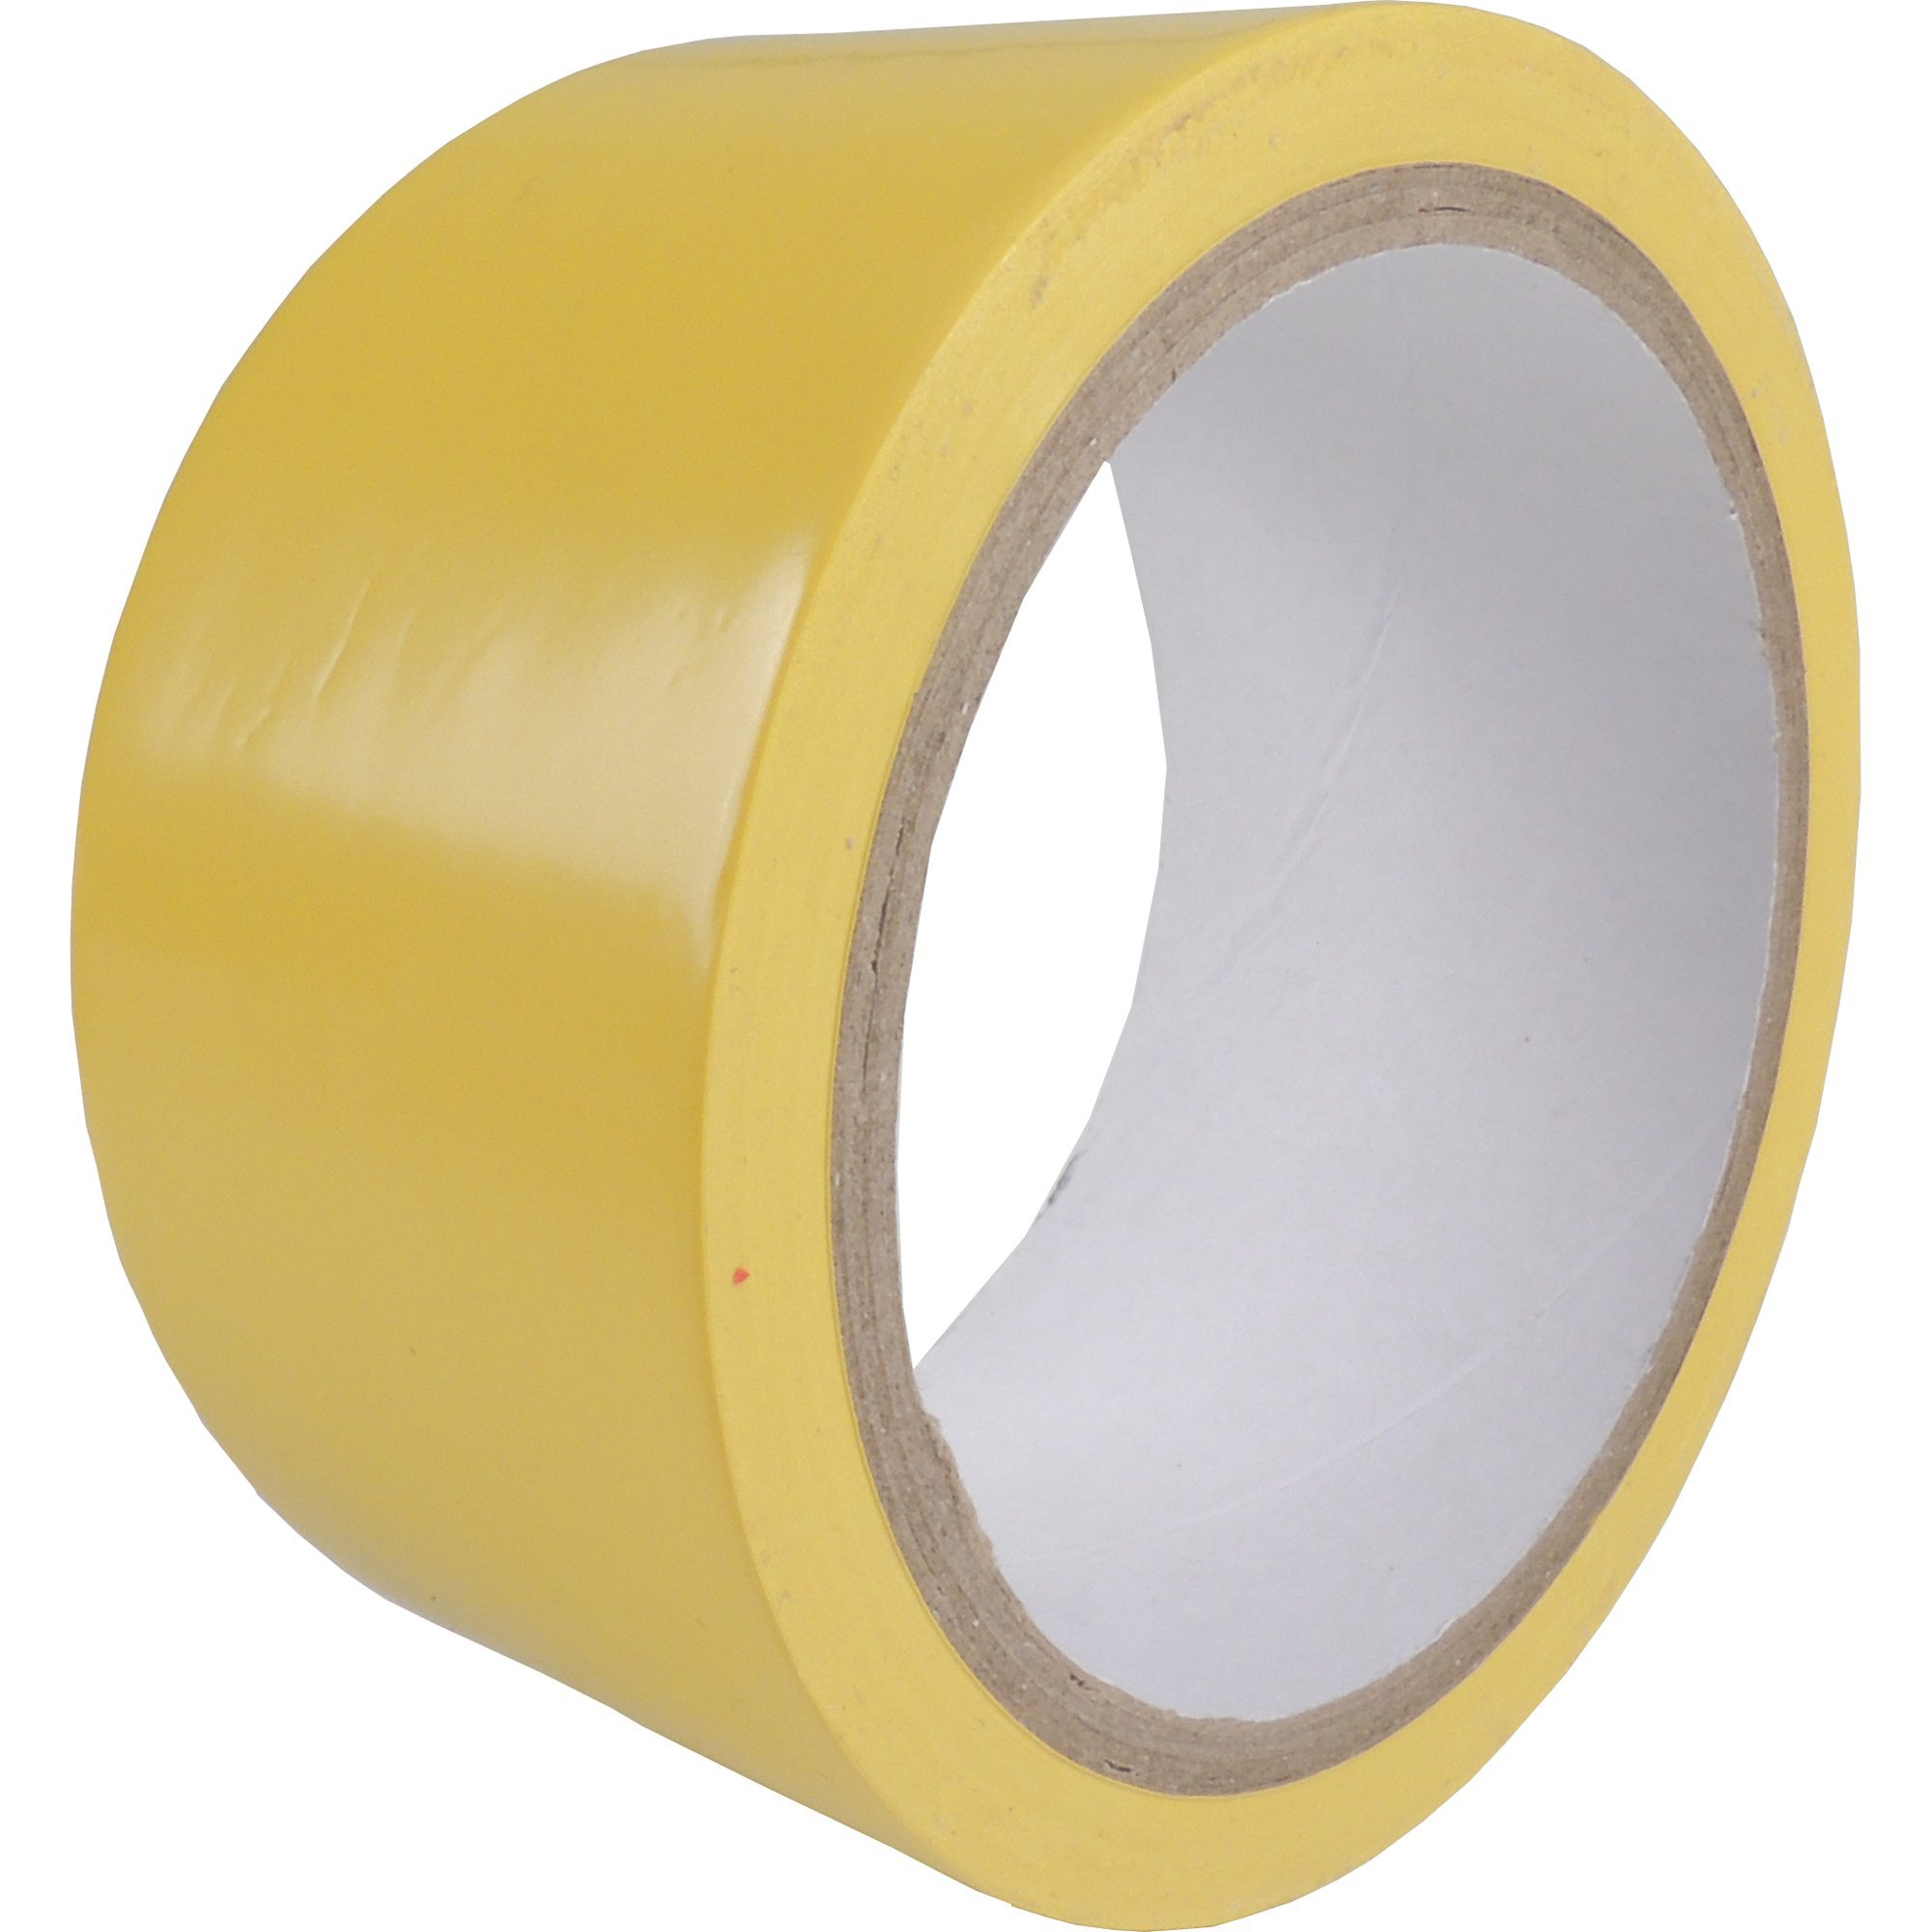 fita demarcacao de solo memoravel amarela brasfort 48mm x 14m 35613 2000 175954